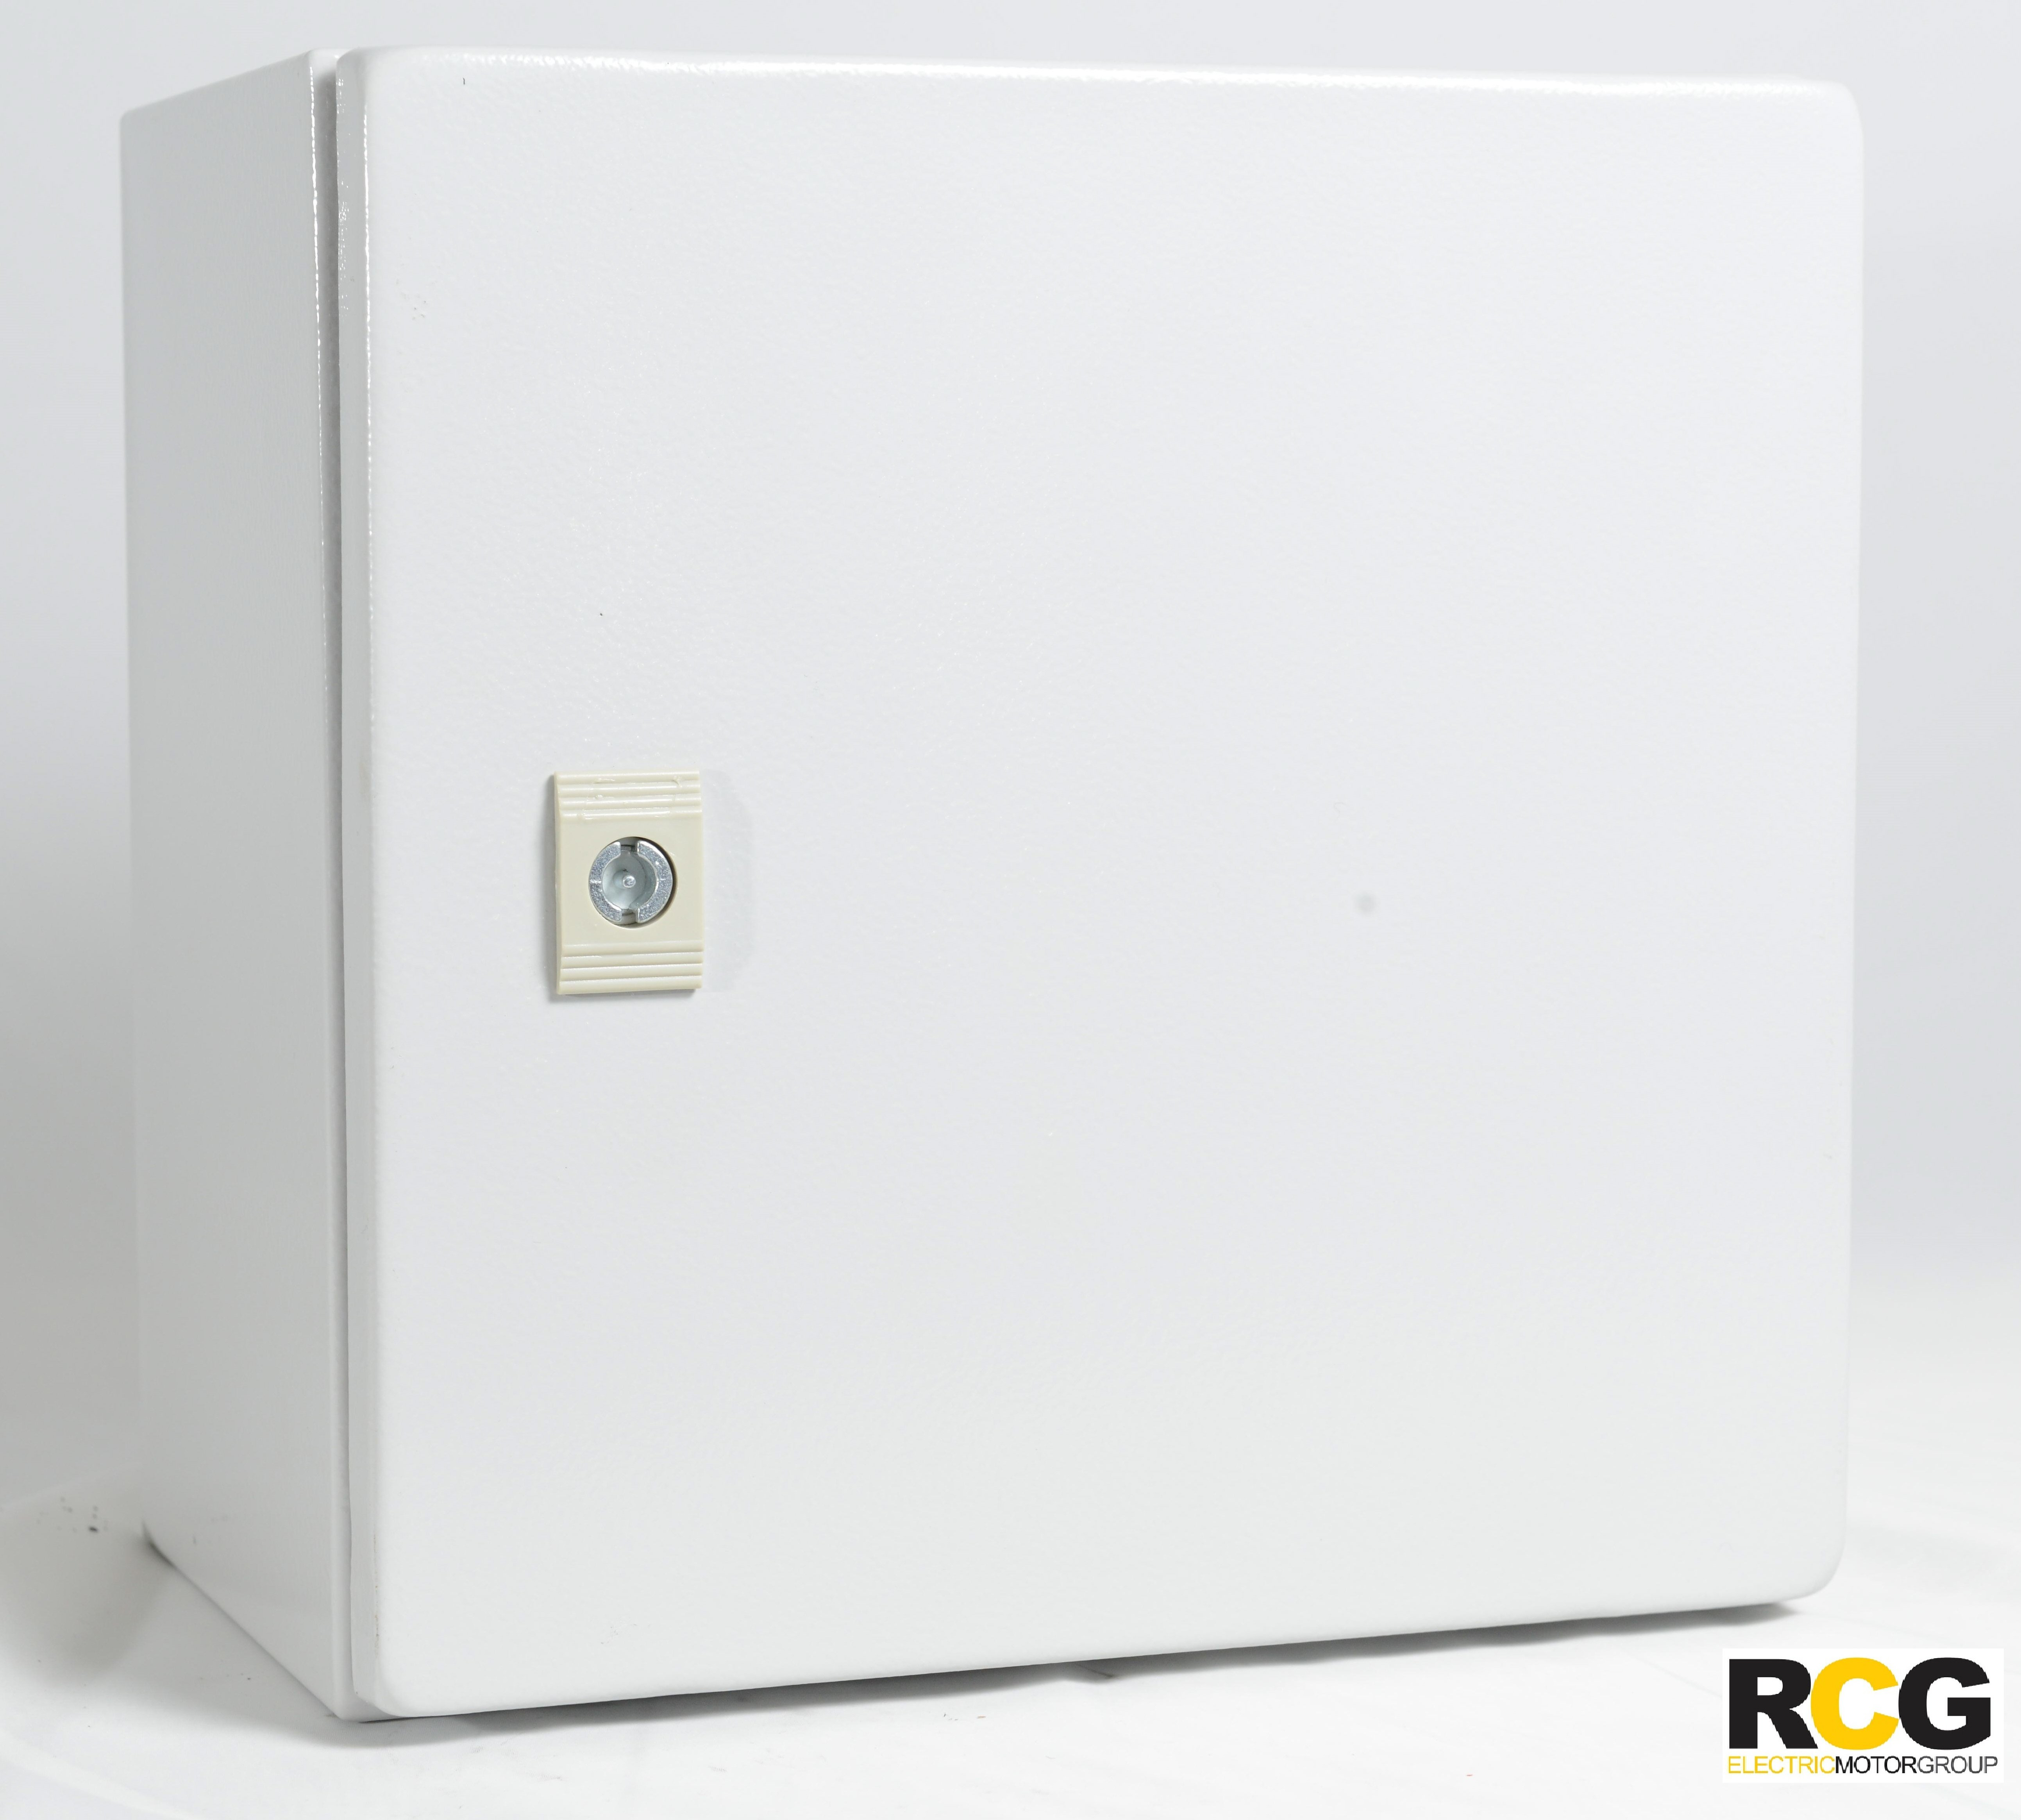 RCG metal enclosure 200x200x150mm - wall mounting (BJS1-22/150)